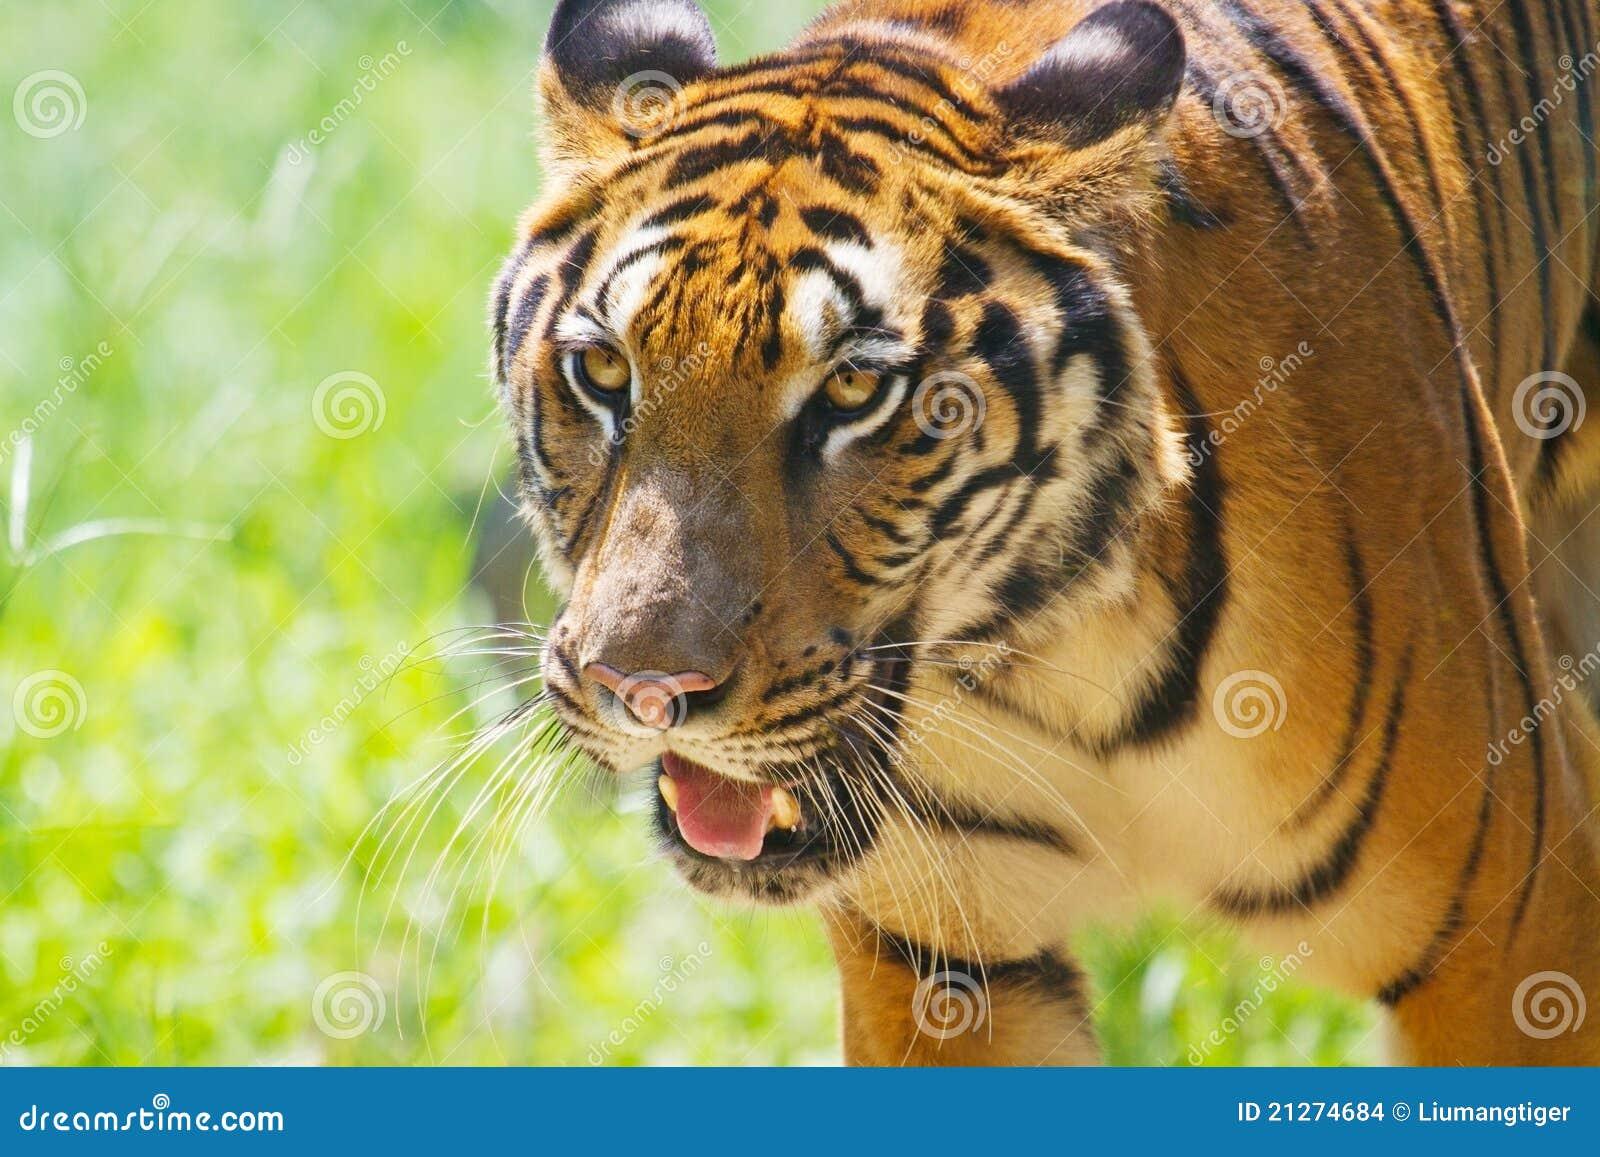 Tigre 2 de marche de sud de la Chine